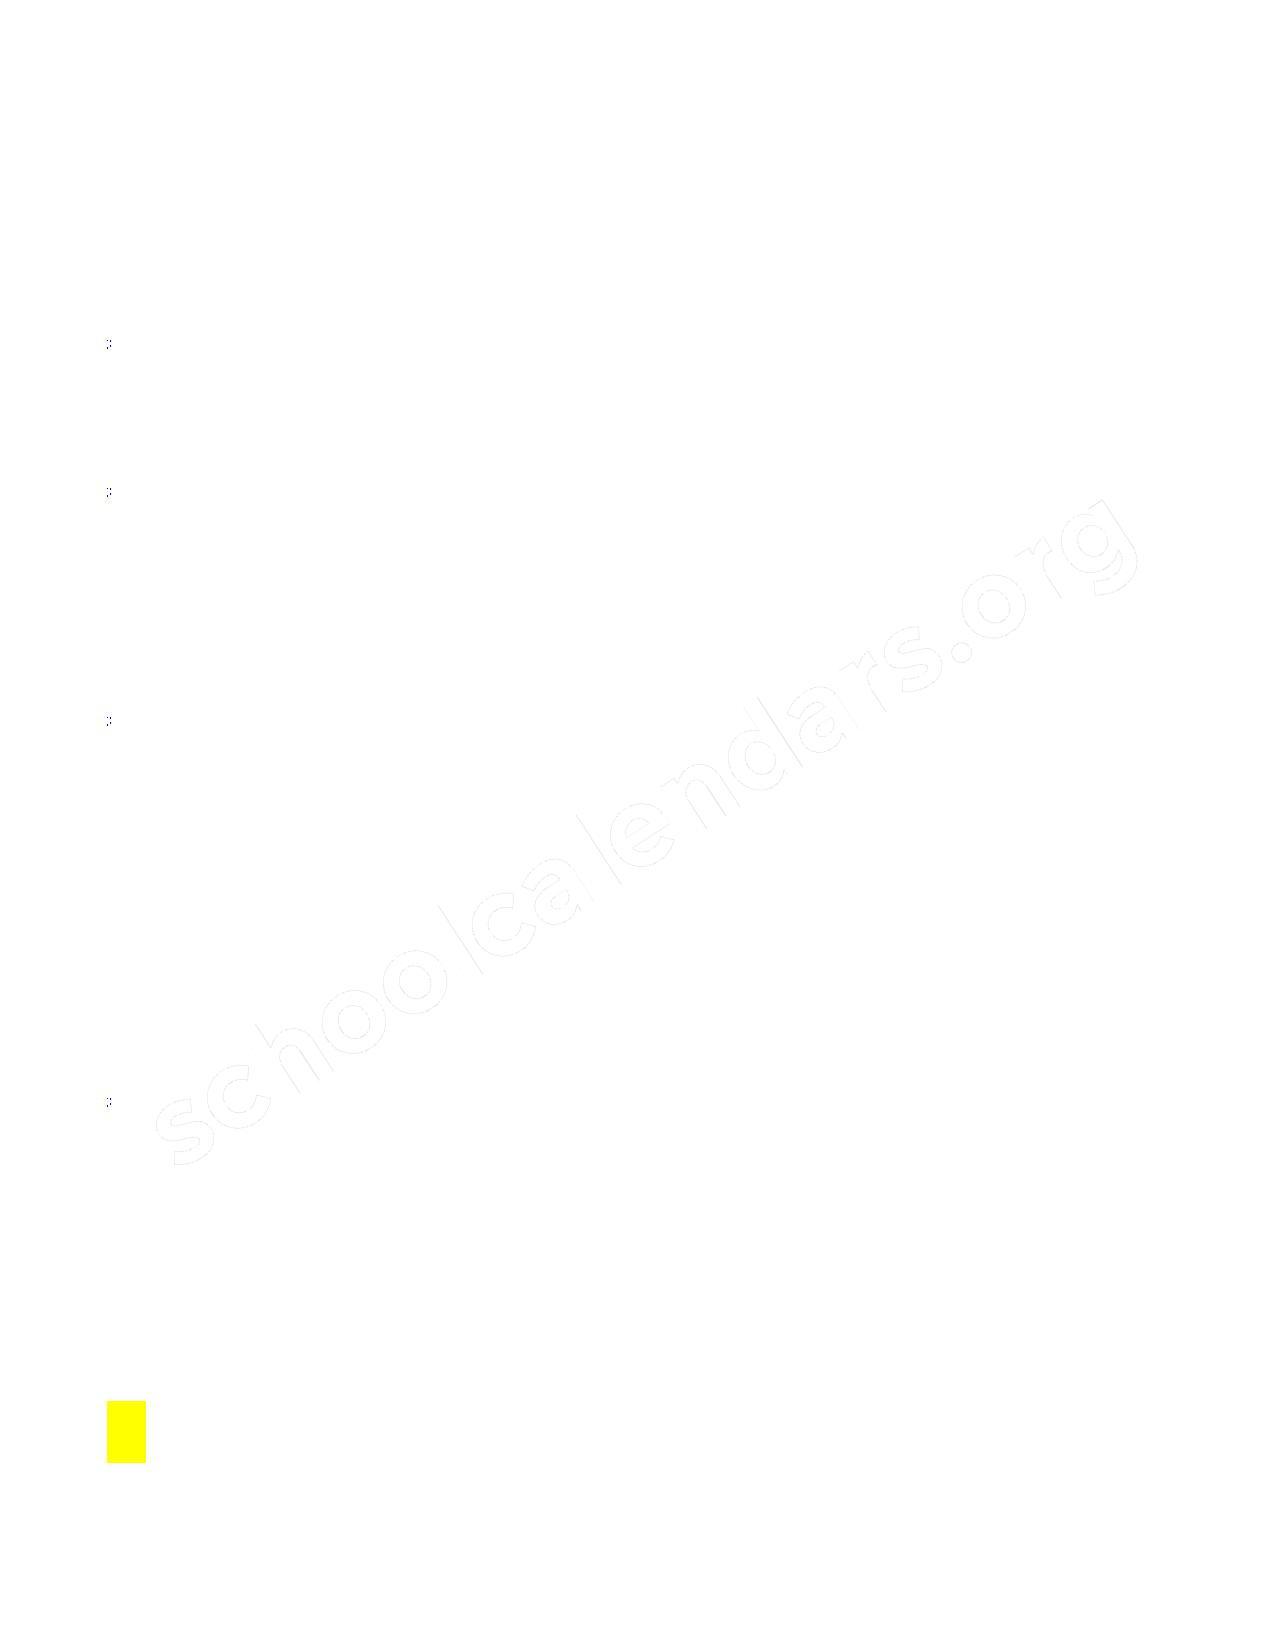 GRIC-Master Calendar – Blackwater Community School – page 2